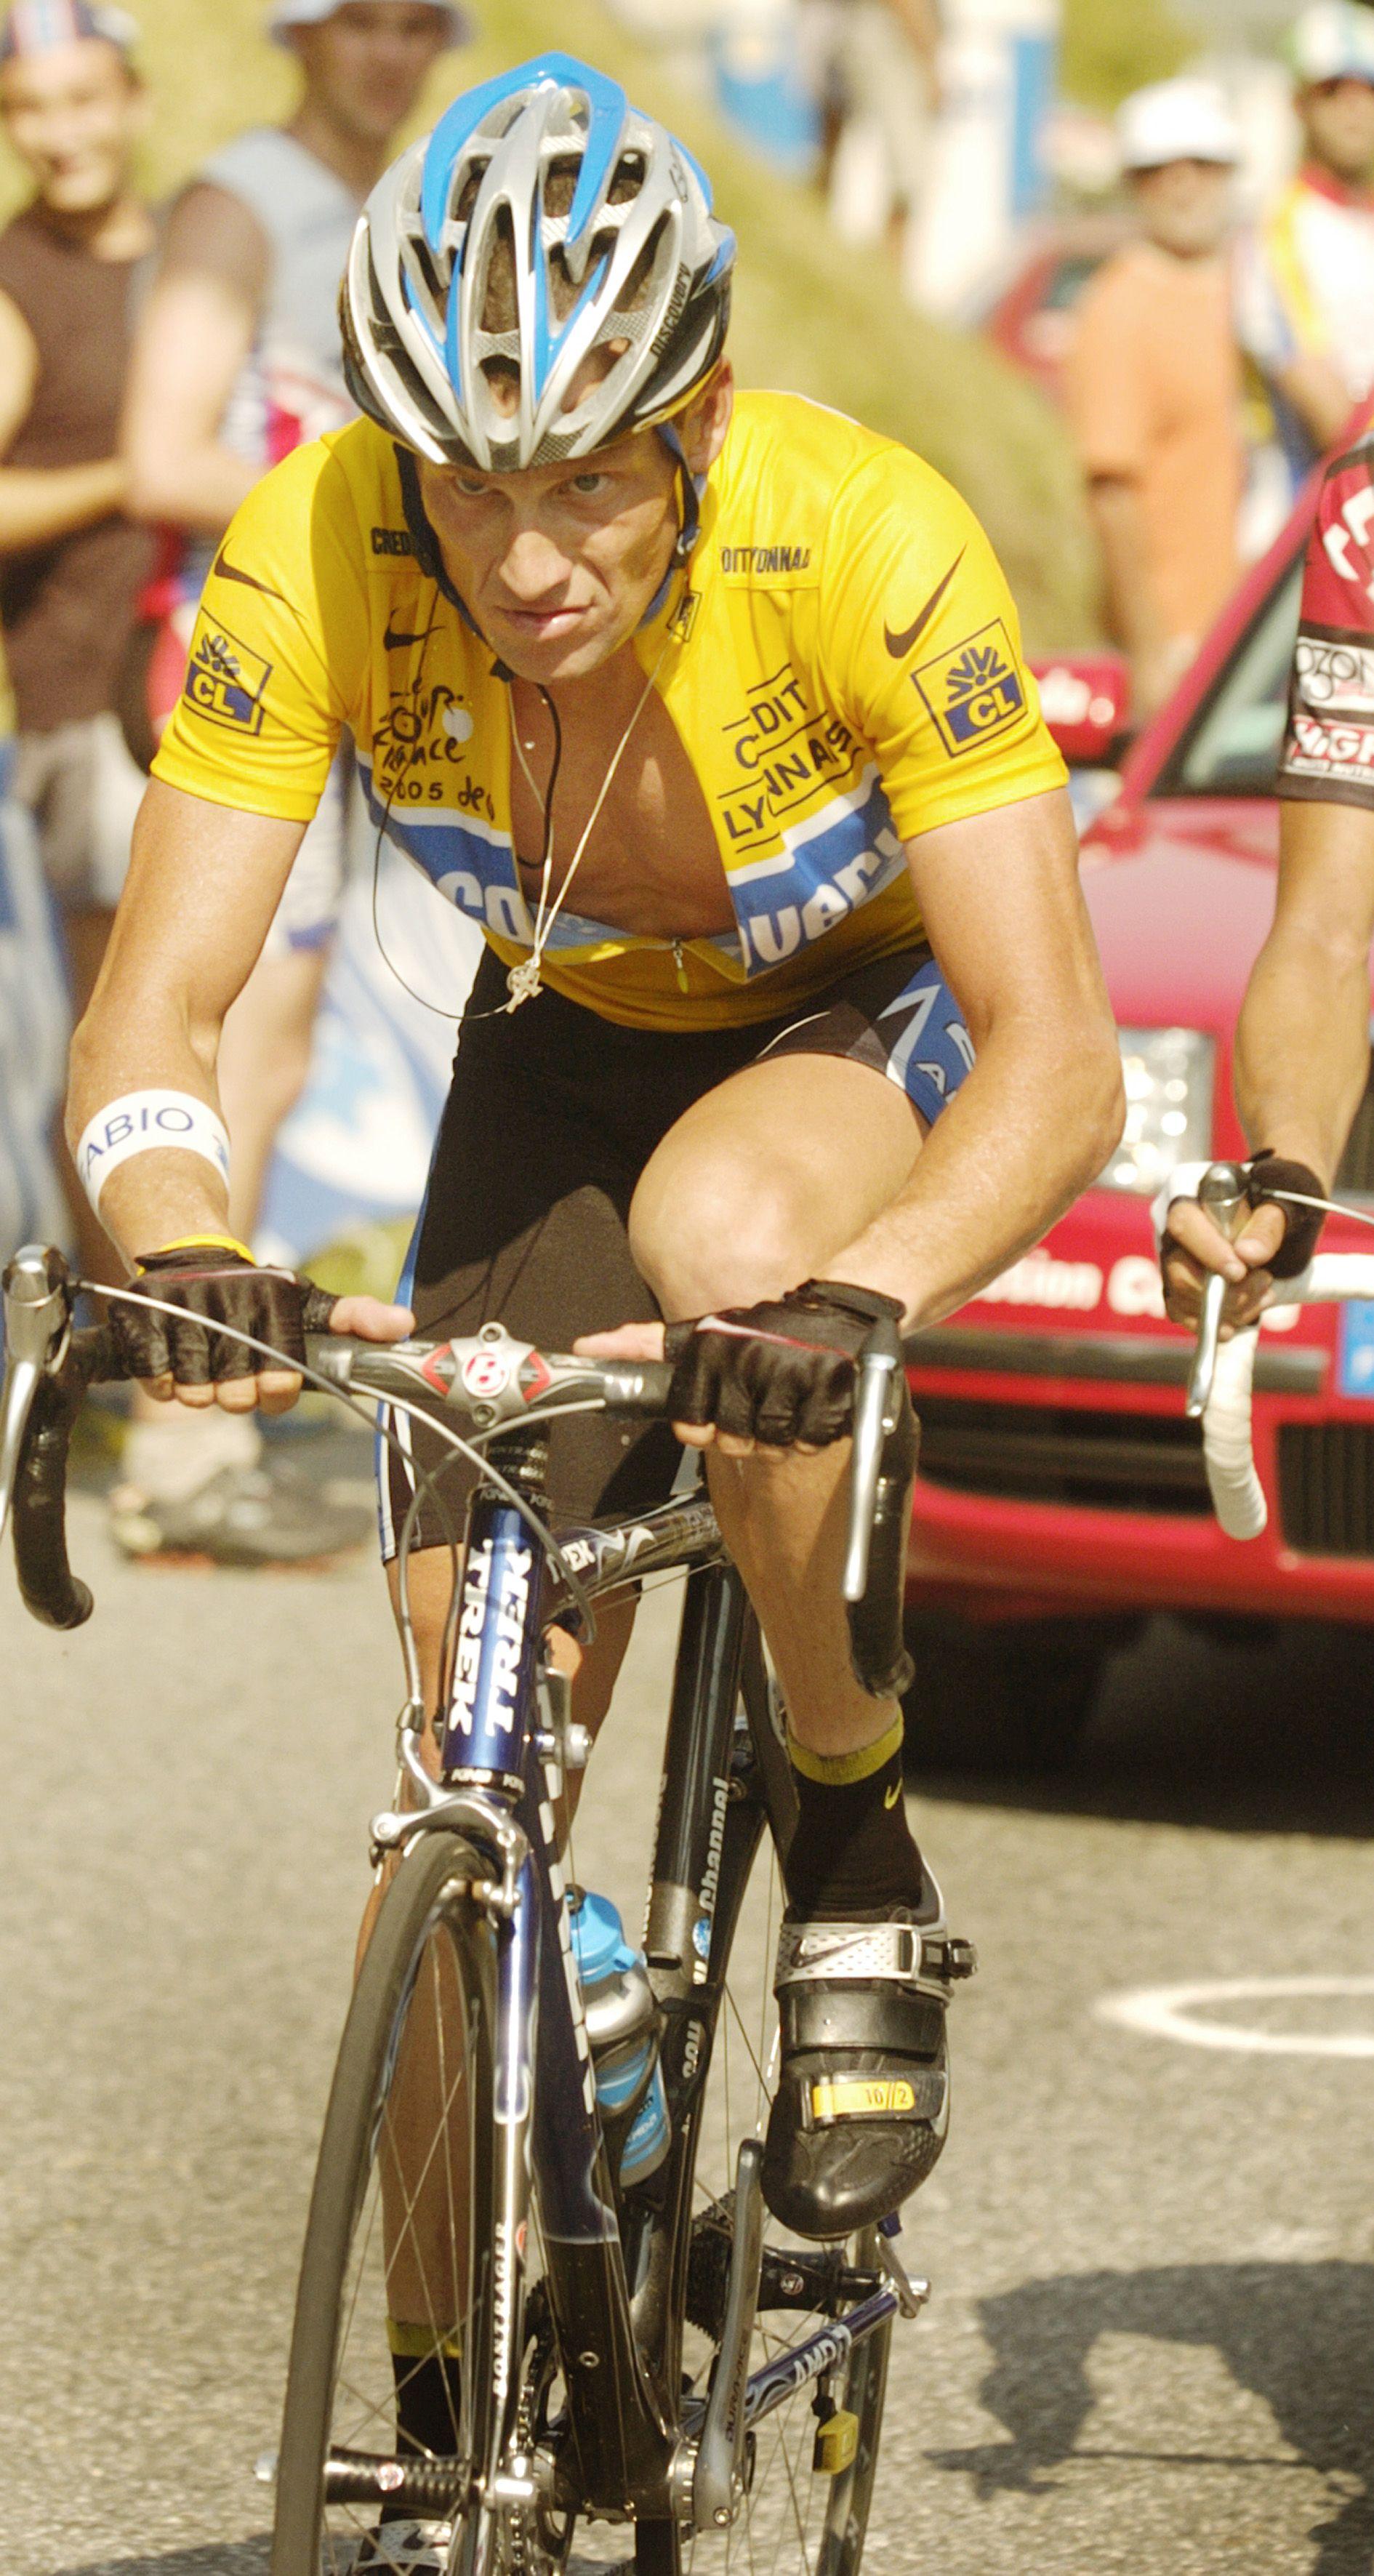 Lance Armstrong Tour De France 2005 Photo Www Johnallenpics Co Uk